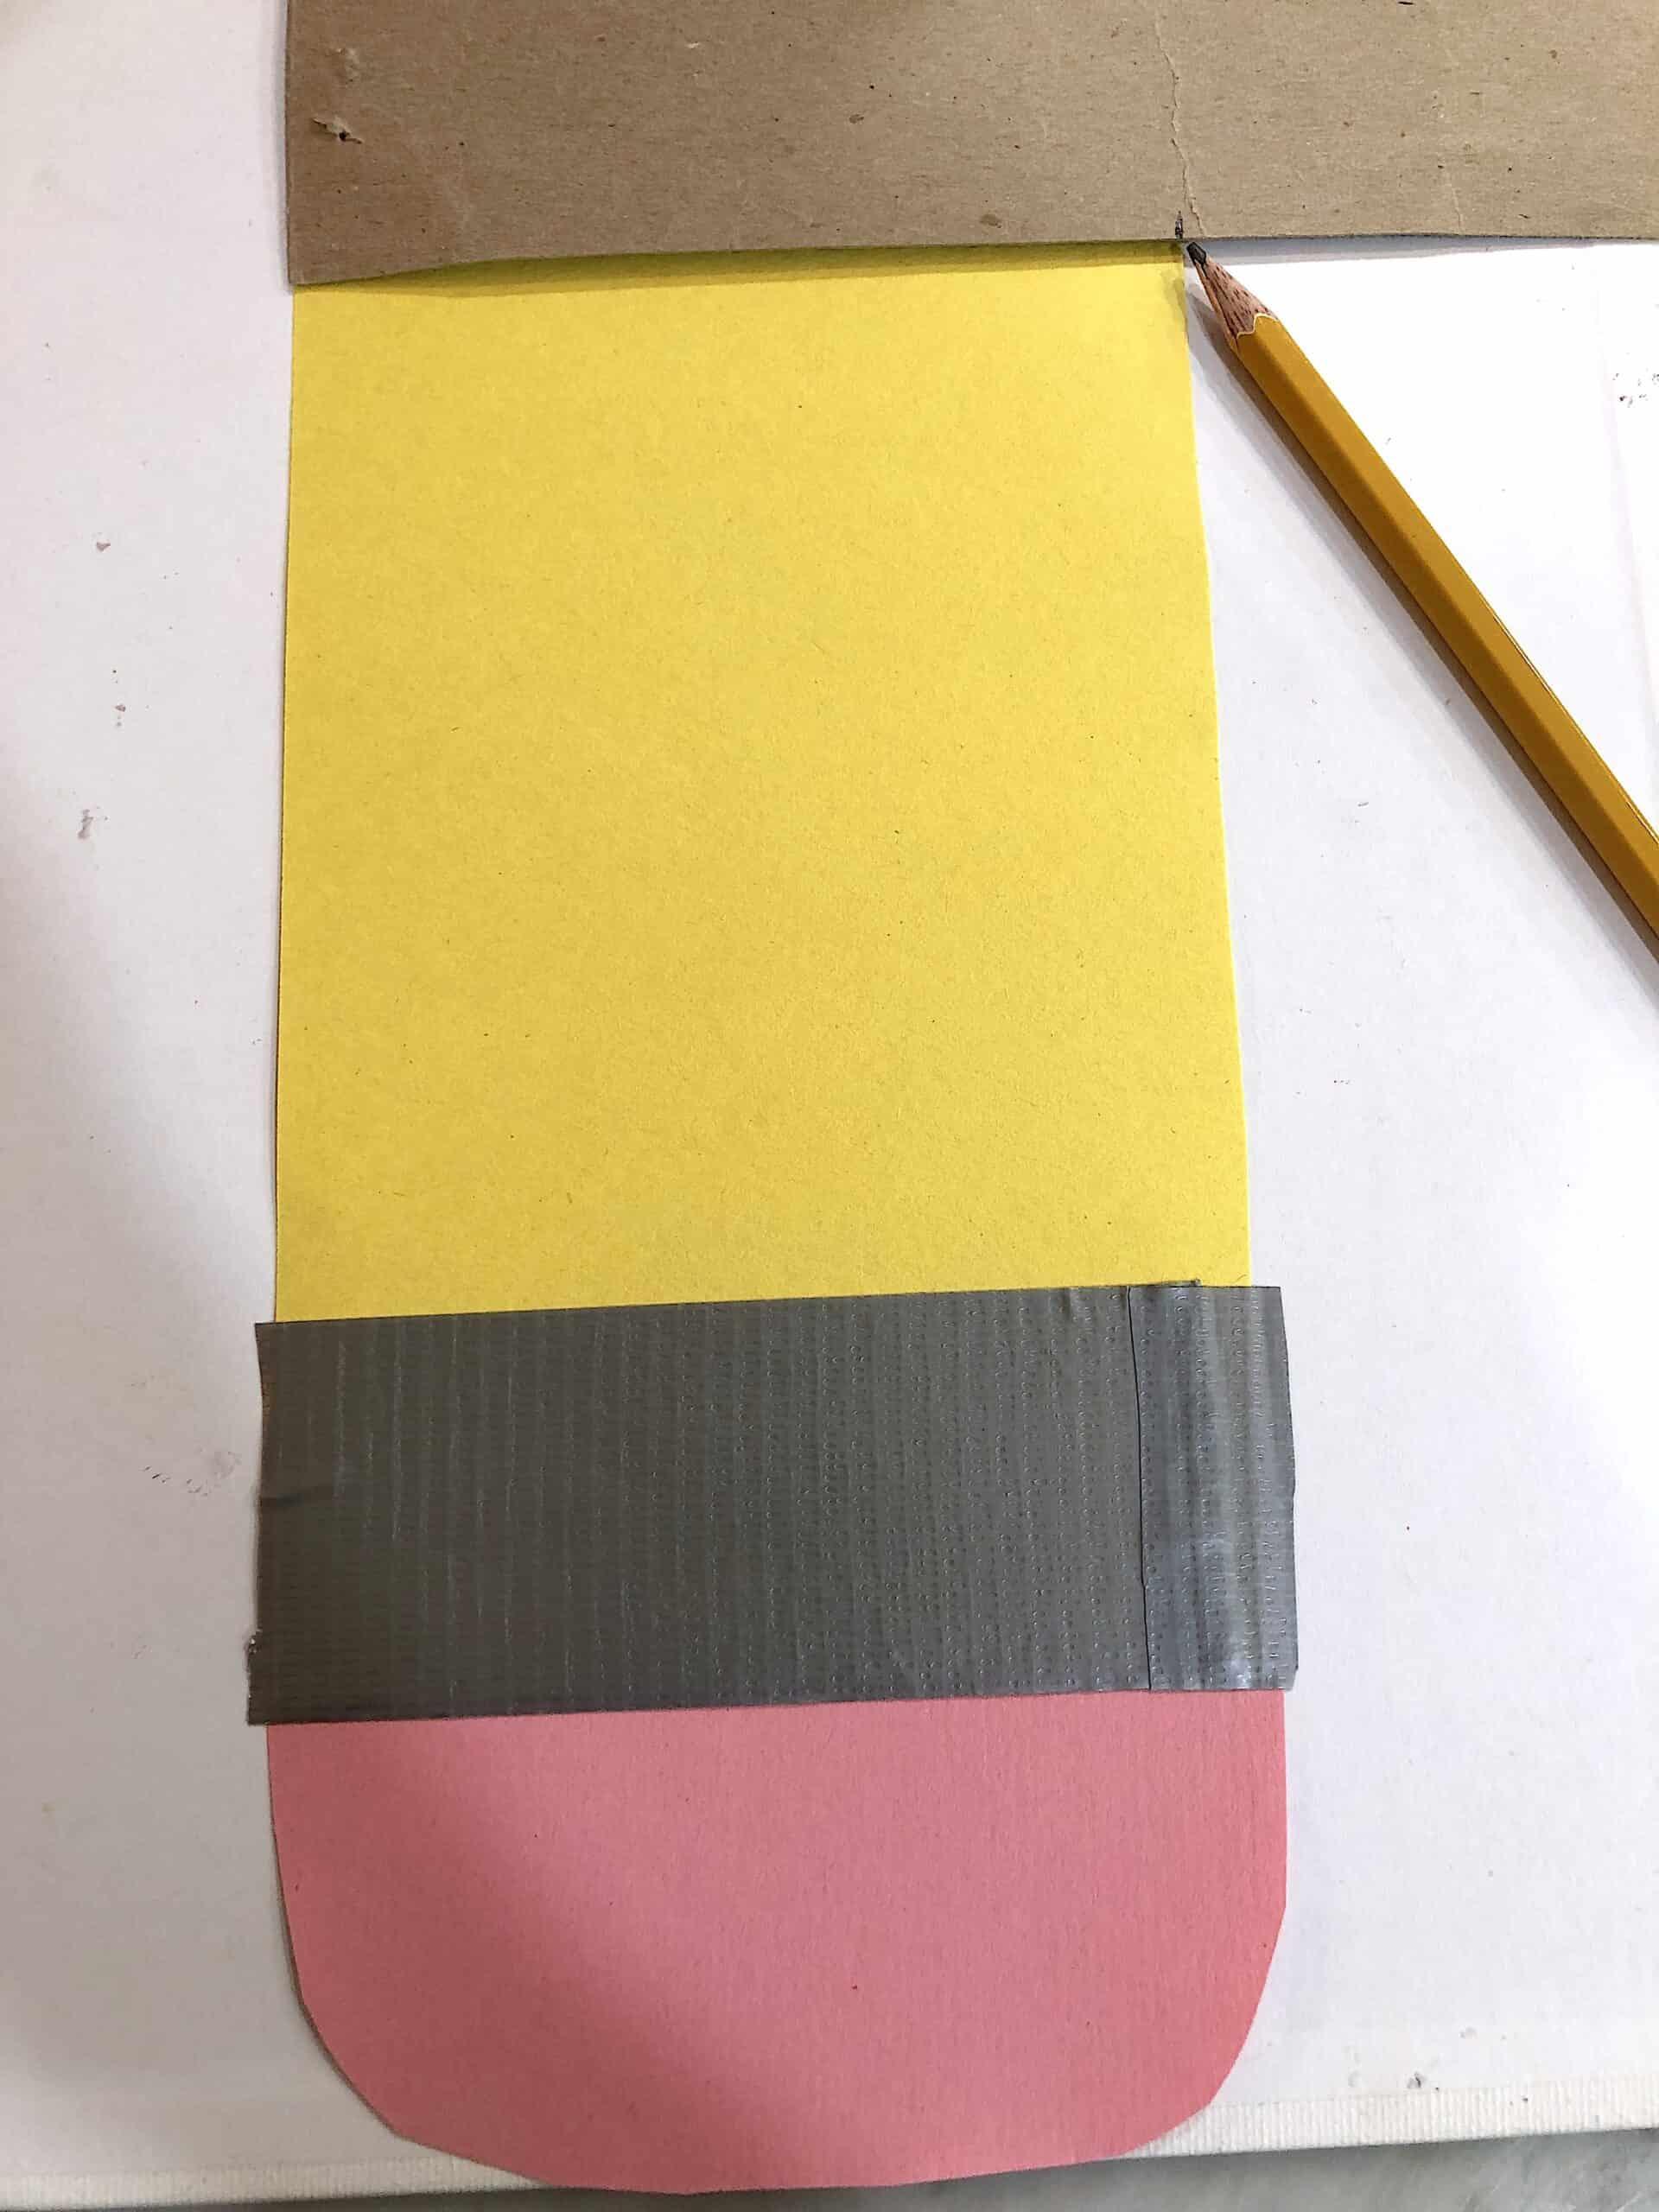 Back-To-School-Craft-pencil